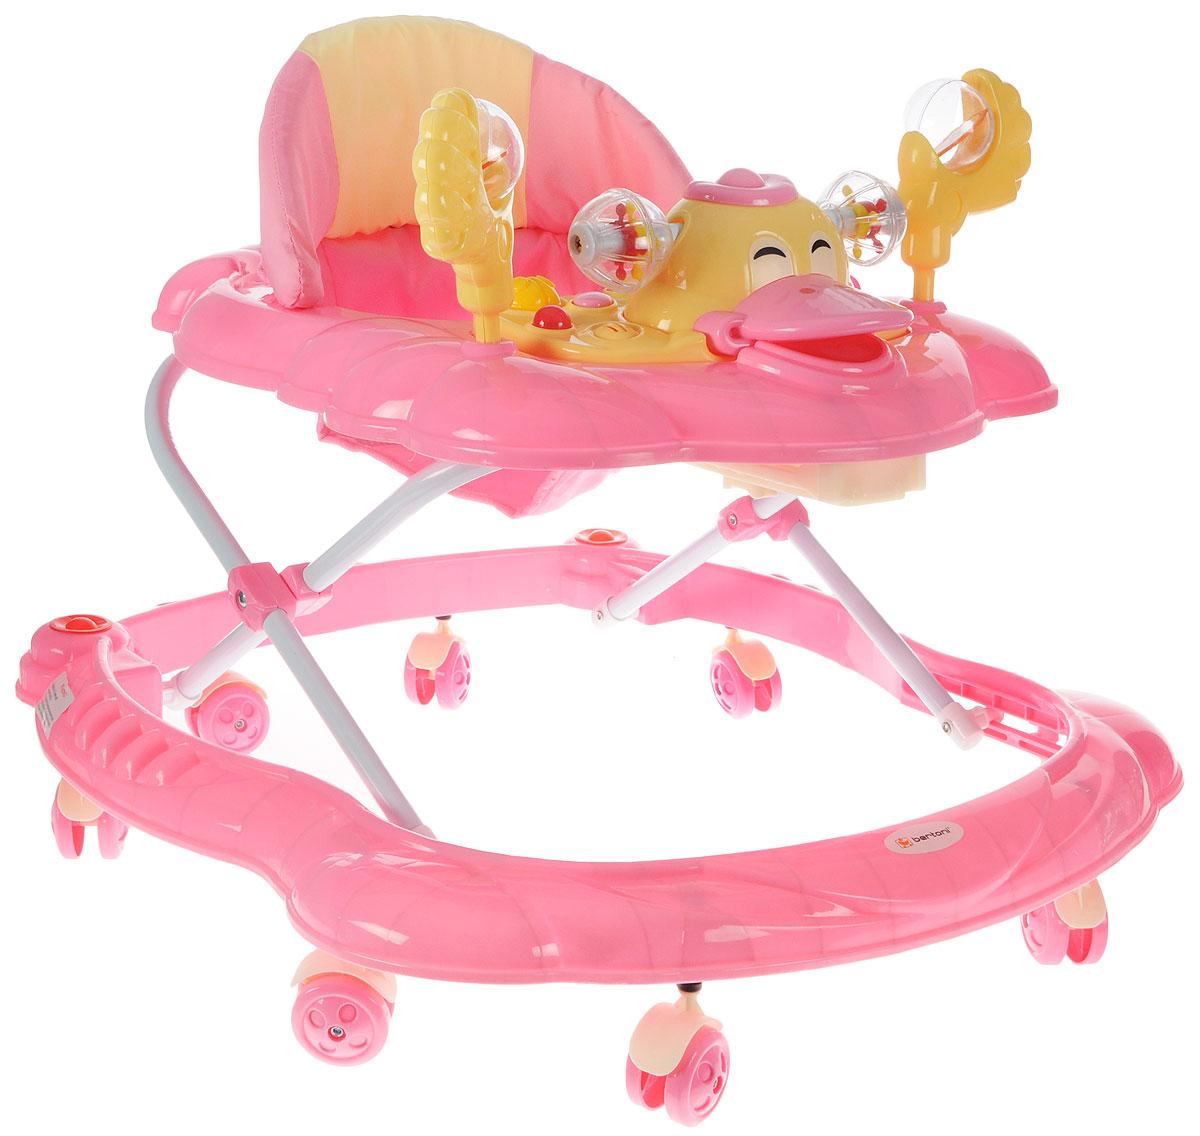 Bertoni Ходунки BW 10 цвет розовый -  Ходунки, прыгунки, качалки